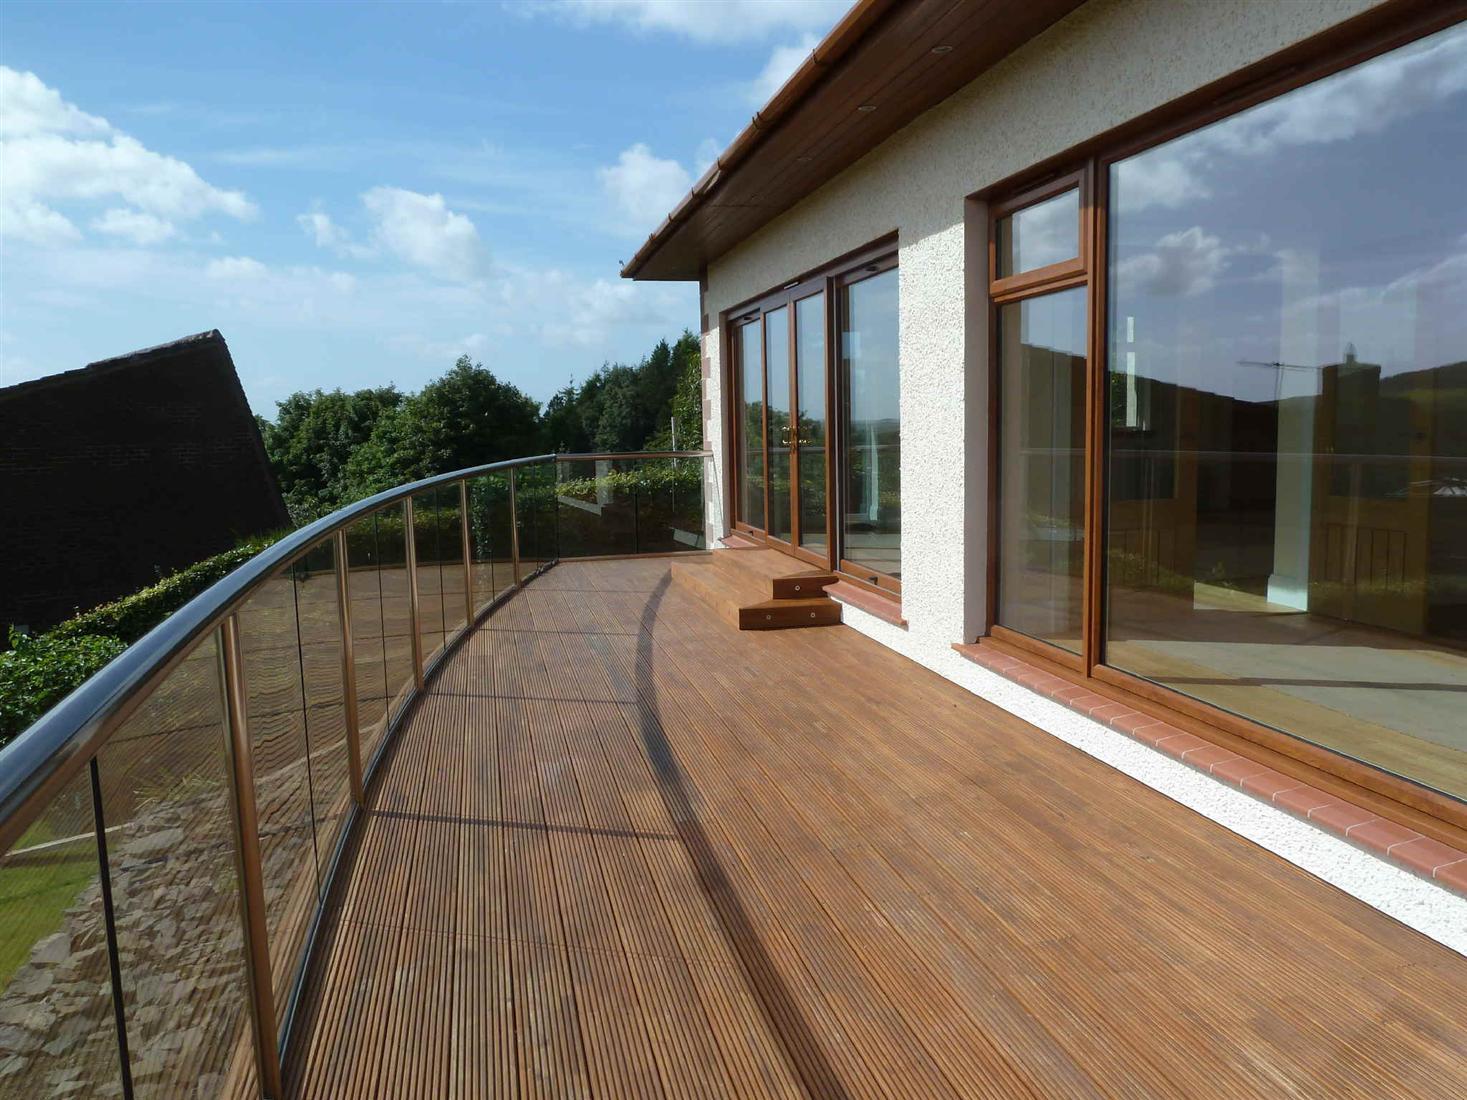 Glass Balustrades without handrails - UK regulations